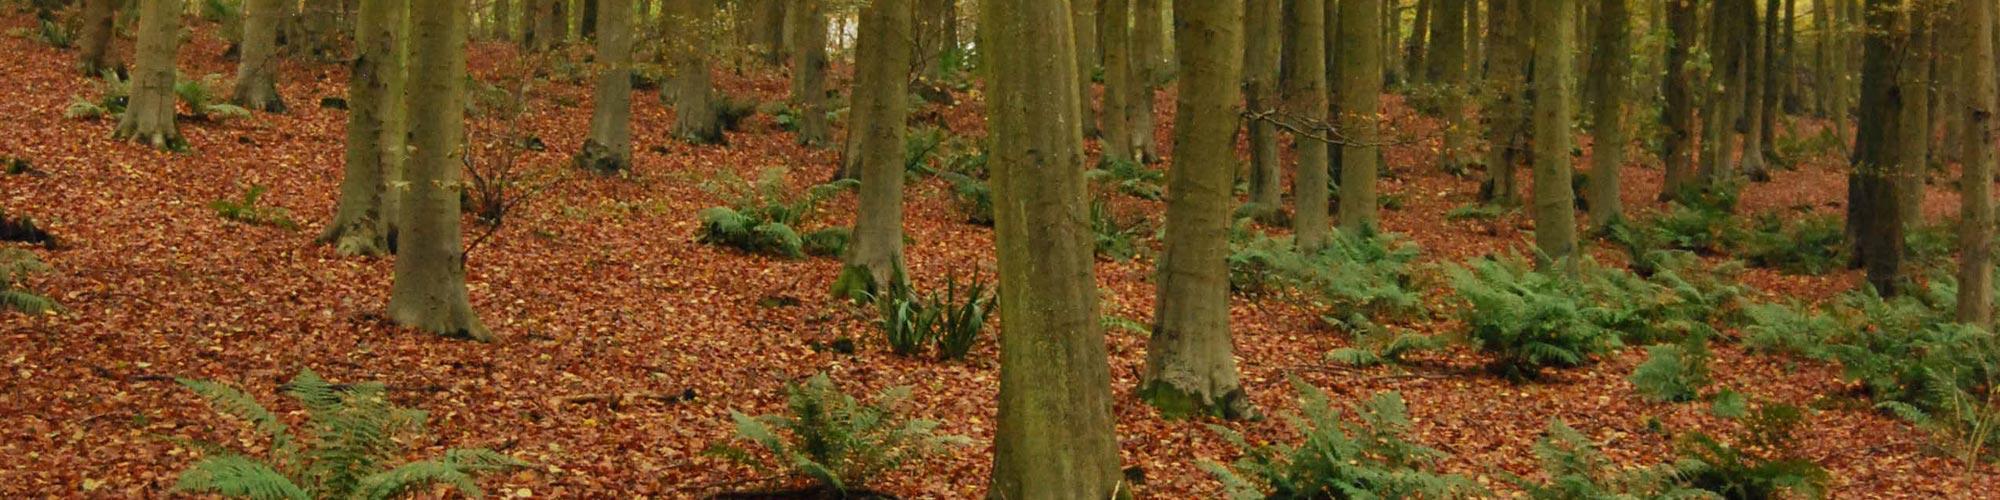 Truffle-And-Mushroom-Hunter-Woodland-Management